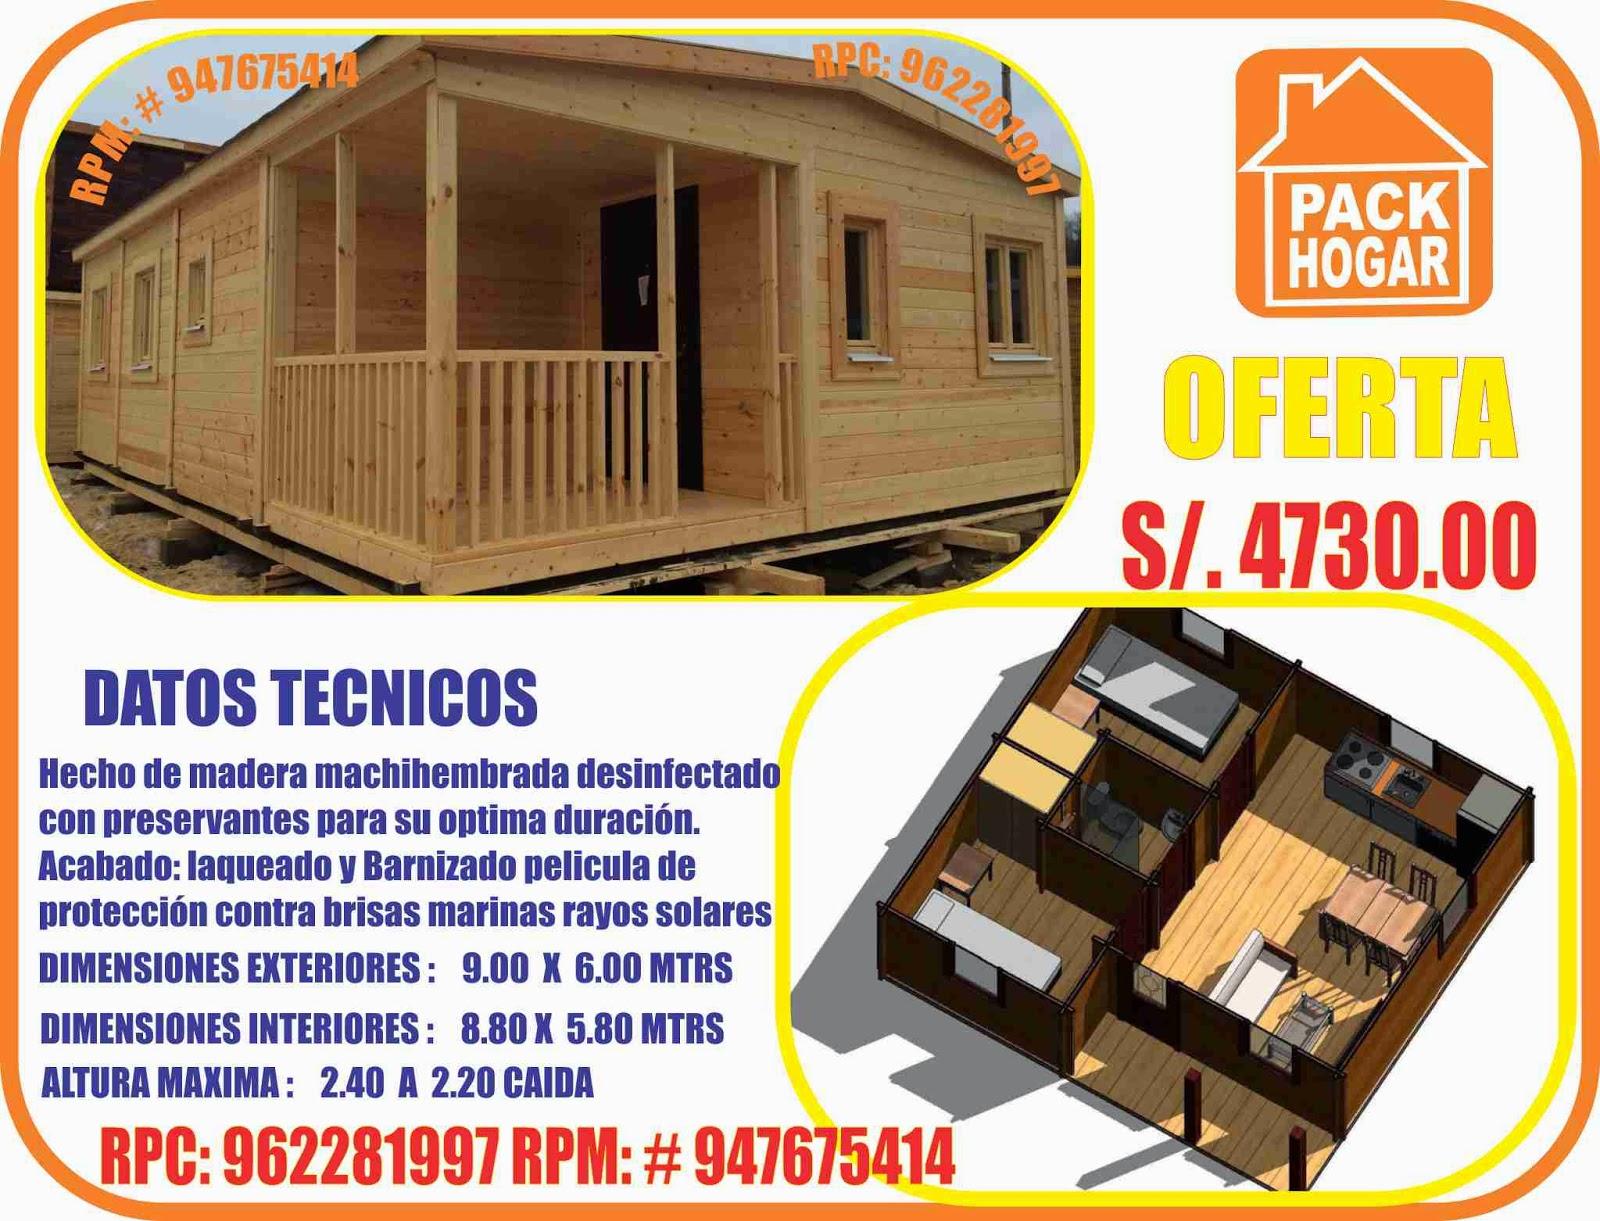 Modelos de casas prefabricadas economicas para campo playa - Casas prefabricadas tenerife ...